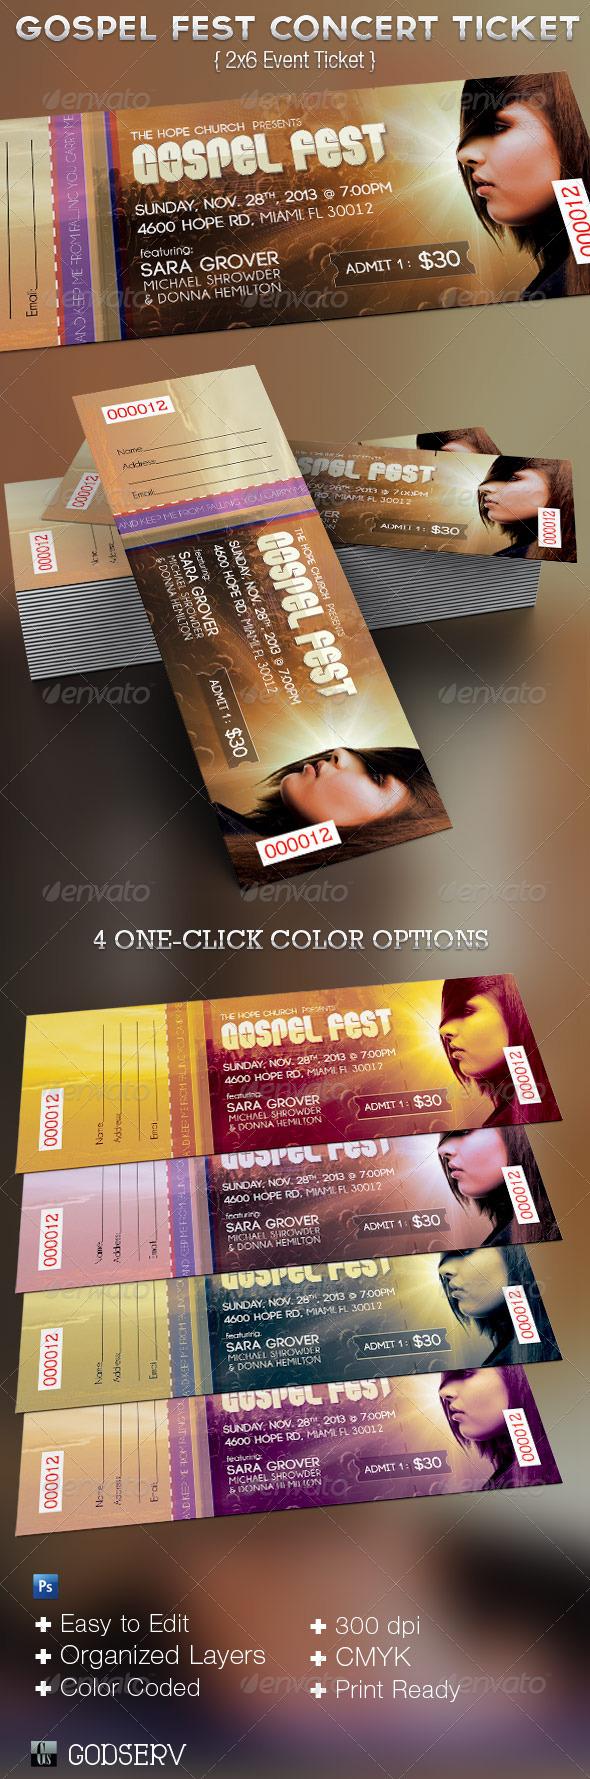 Gospel Fest Concert Ticket Template by Godserv – Concert Ticket Templates